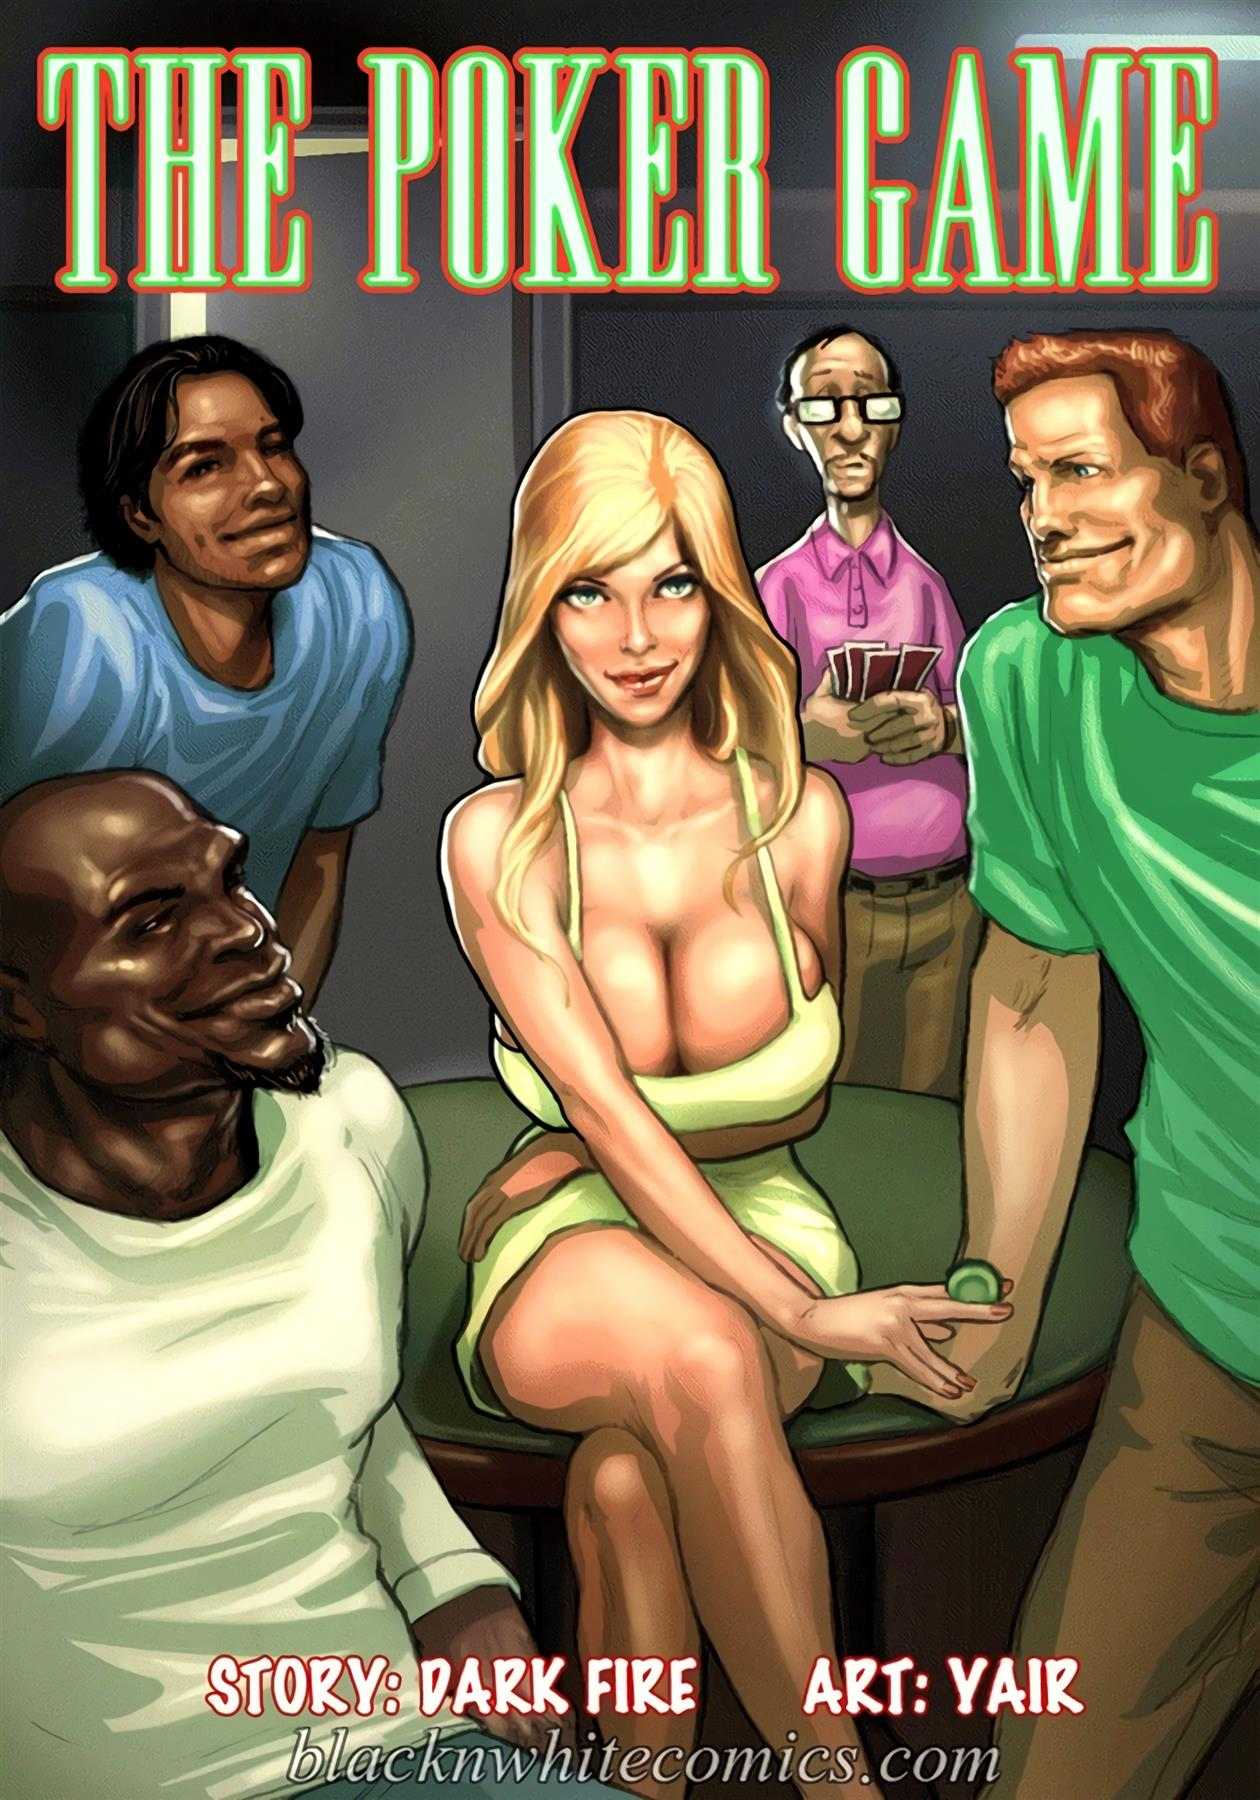 The Poker Game [BlackNwhite] - Foto 1